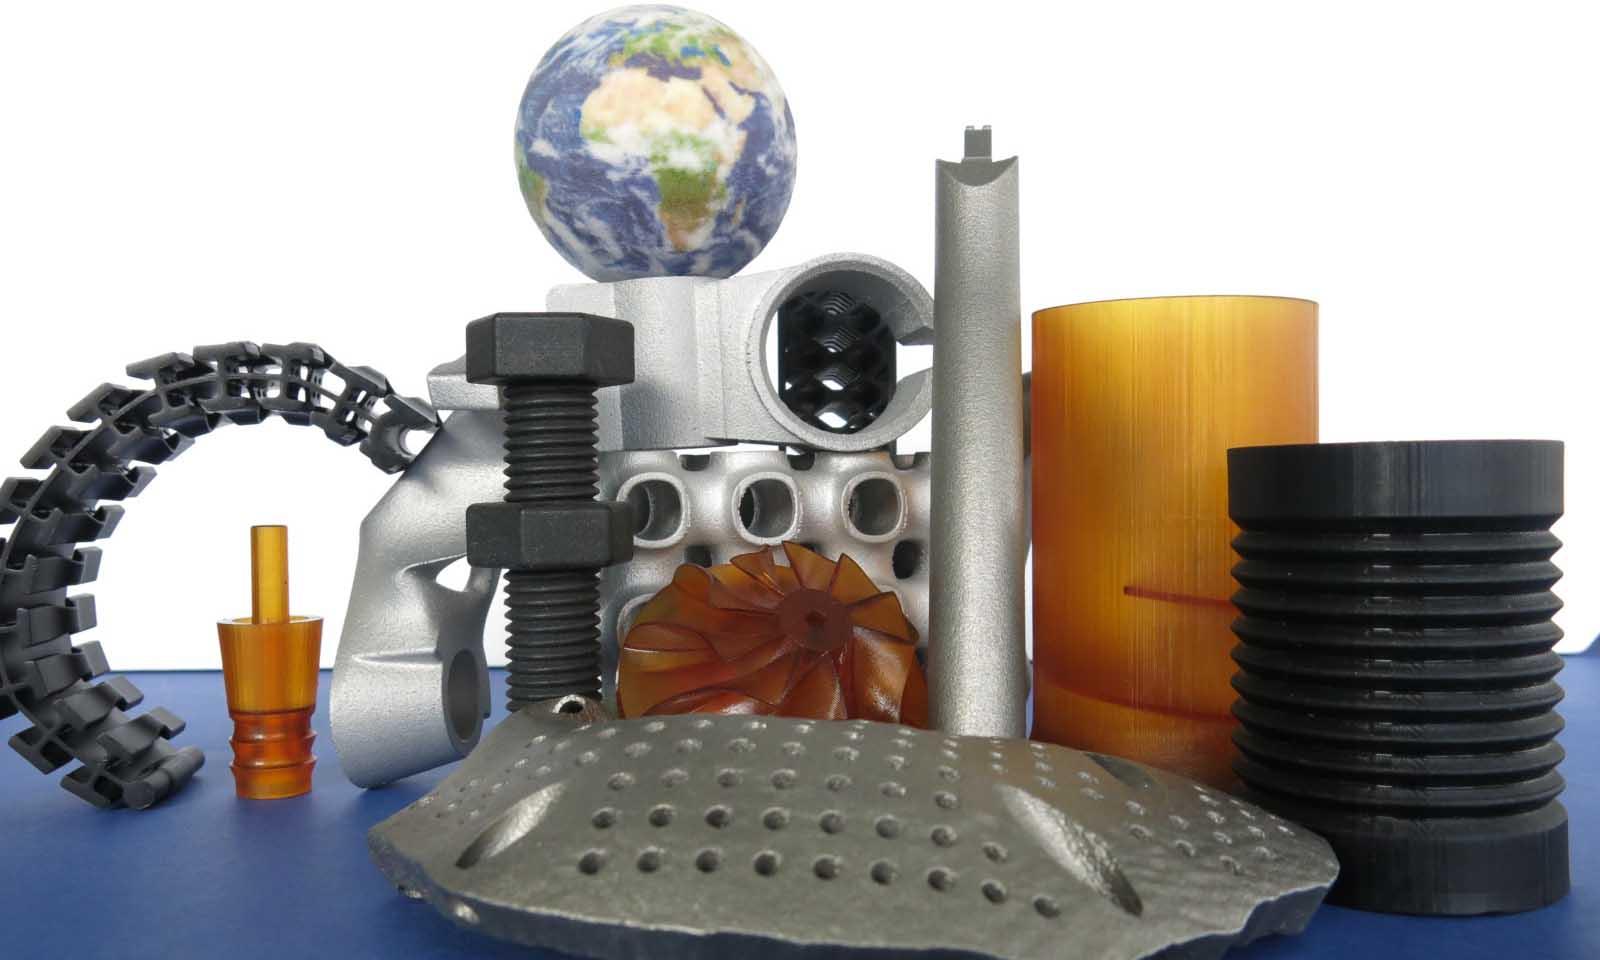 3D Printing materials: Properties and Material Simulation